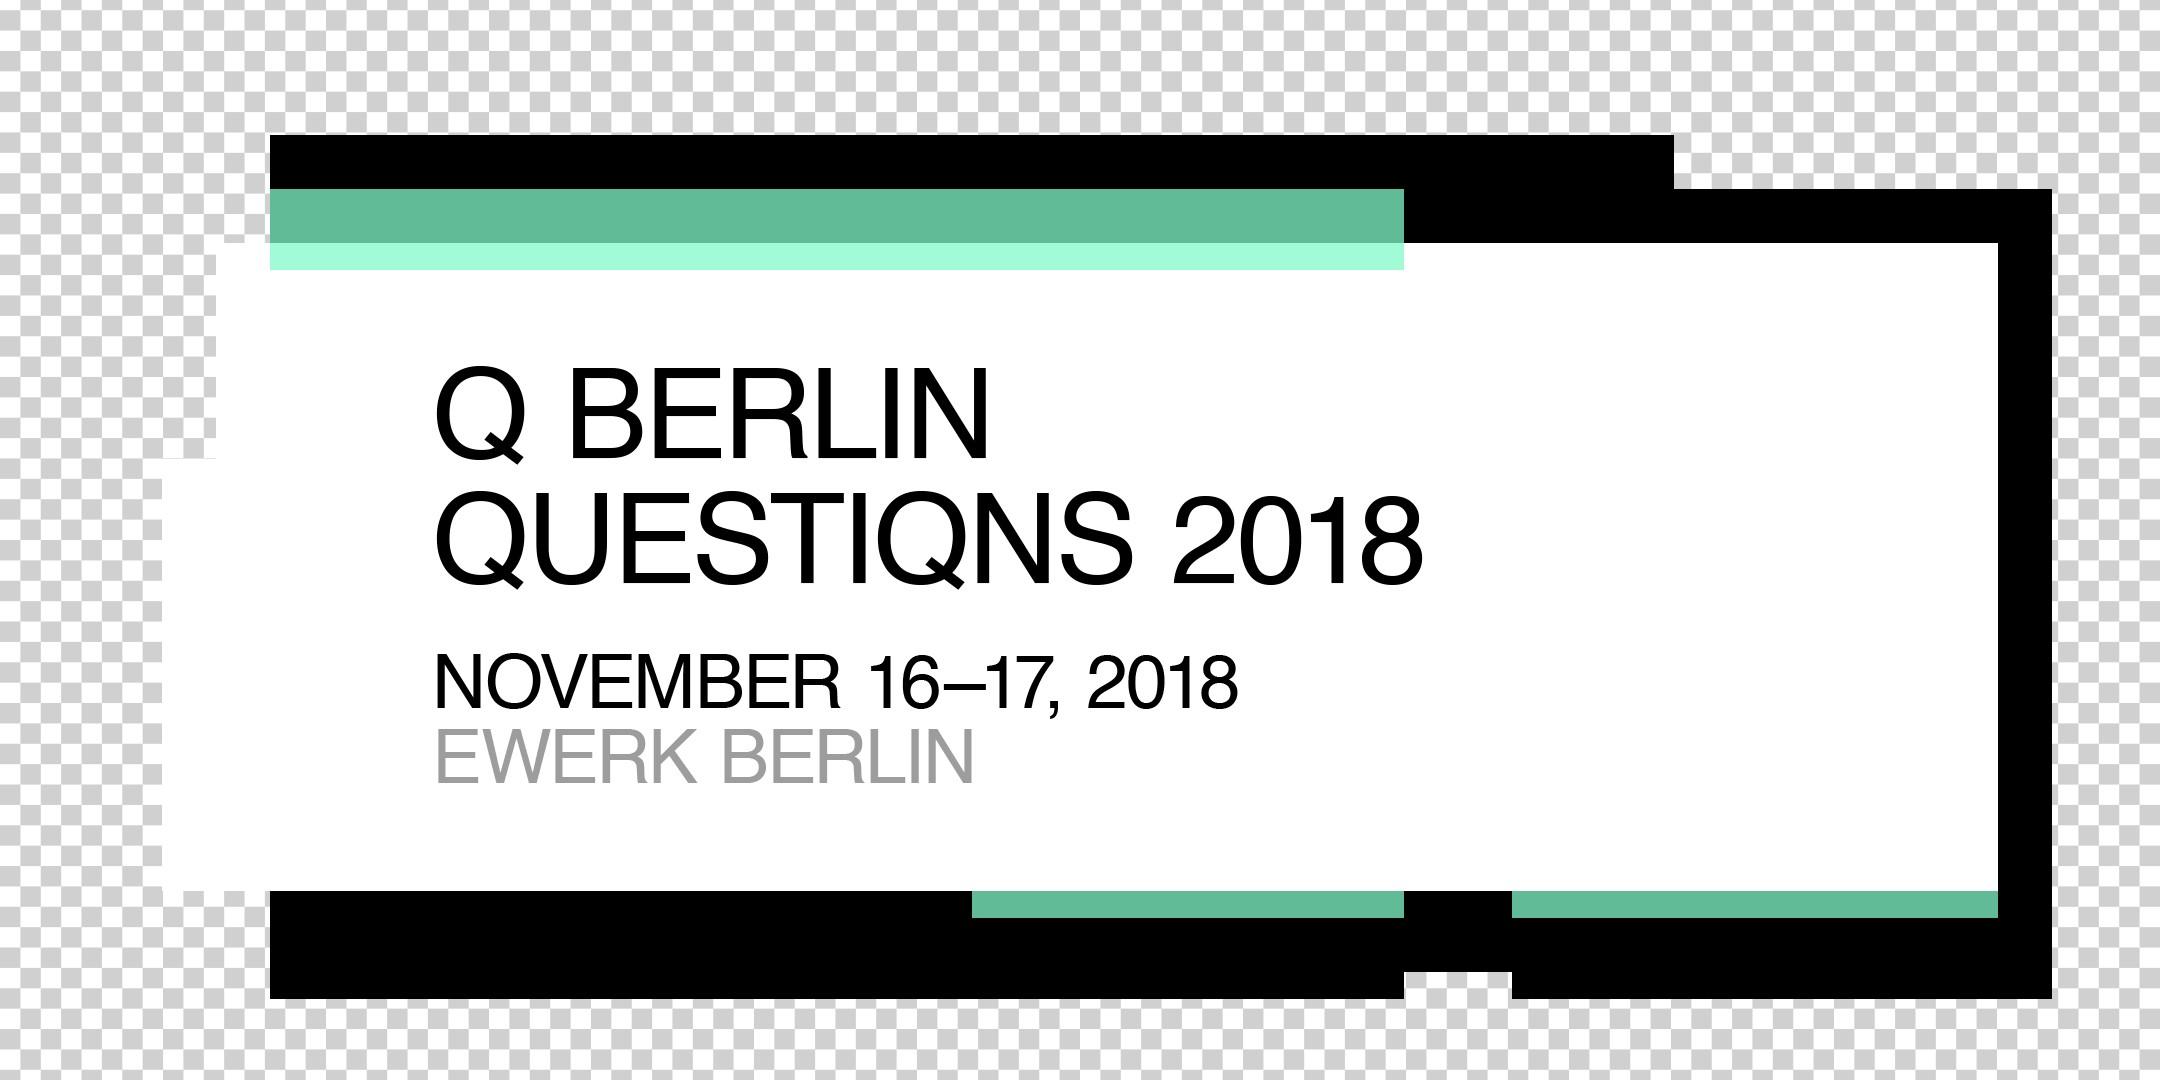 a0684fee0ff Q BERLIN QUESTIQNS 2018